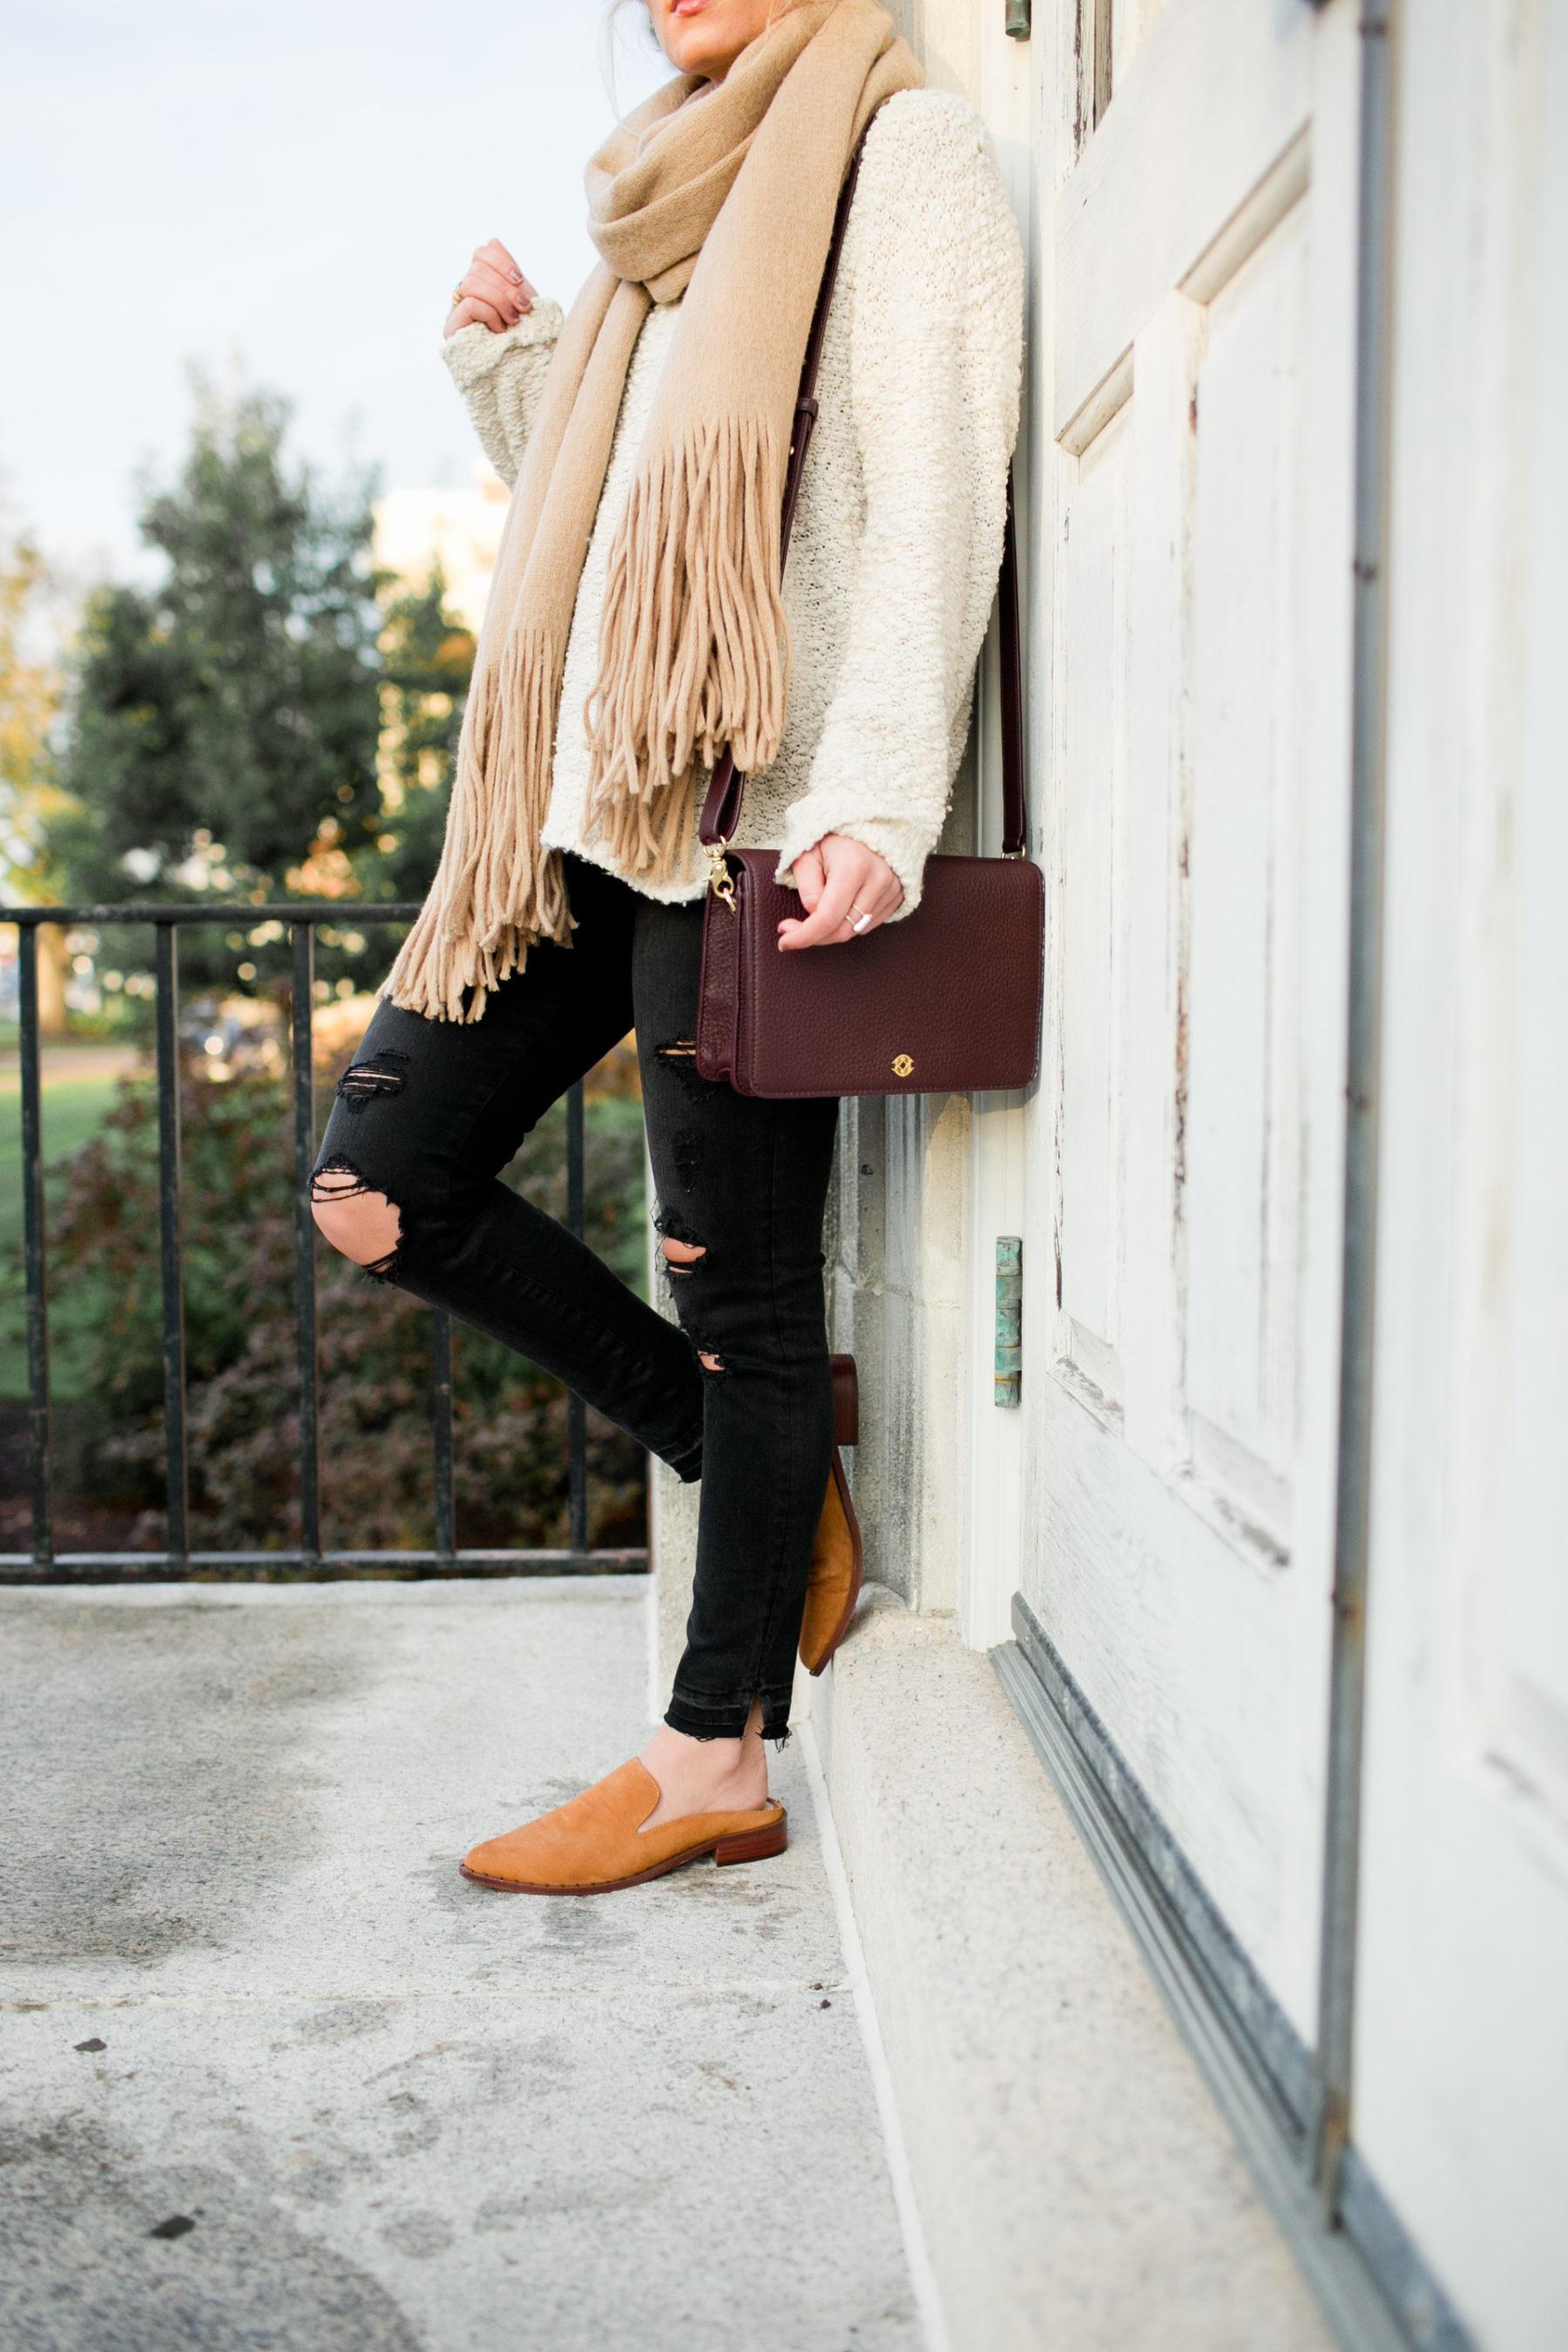 Maroon Handbag Slides Tan scarf